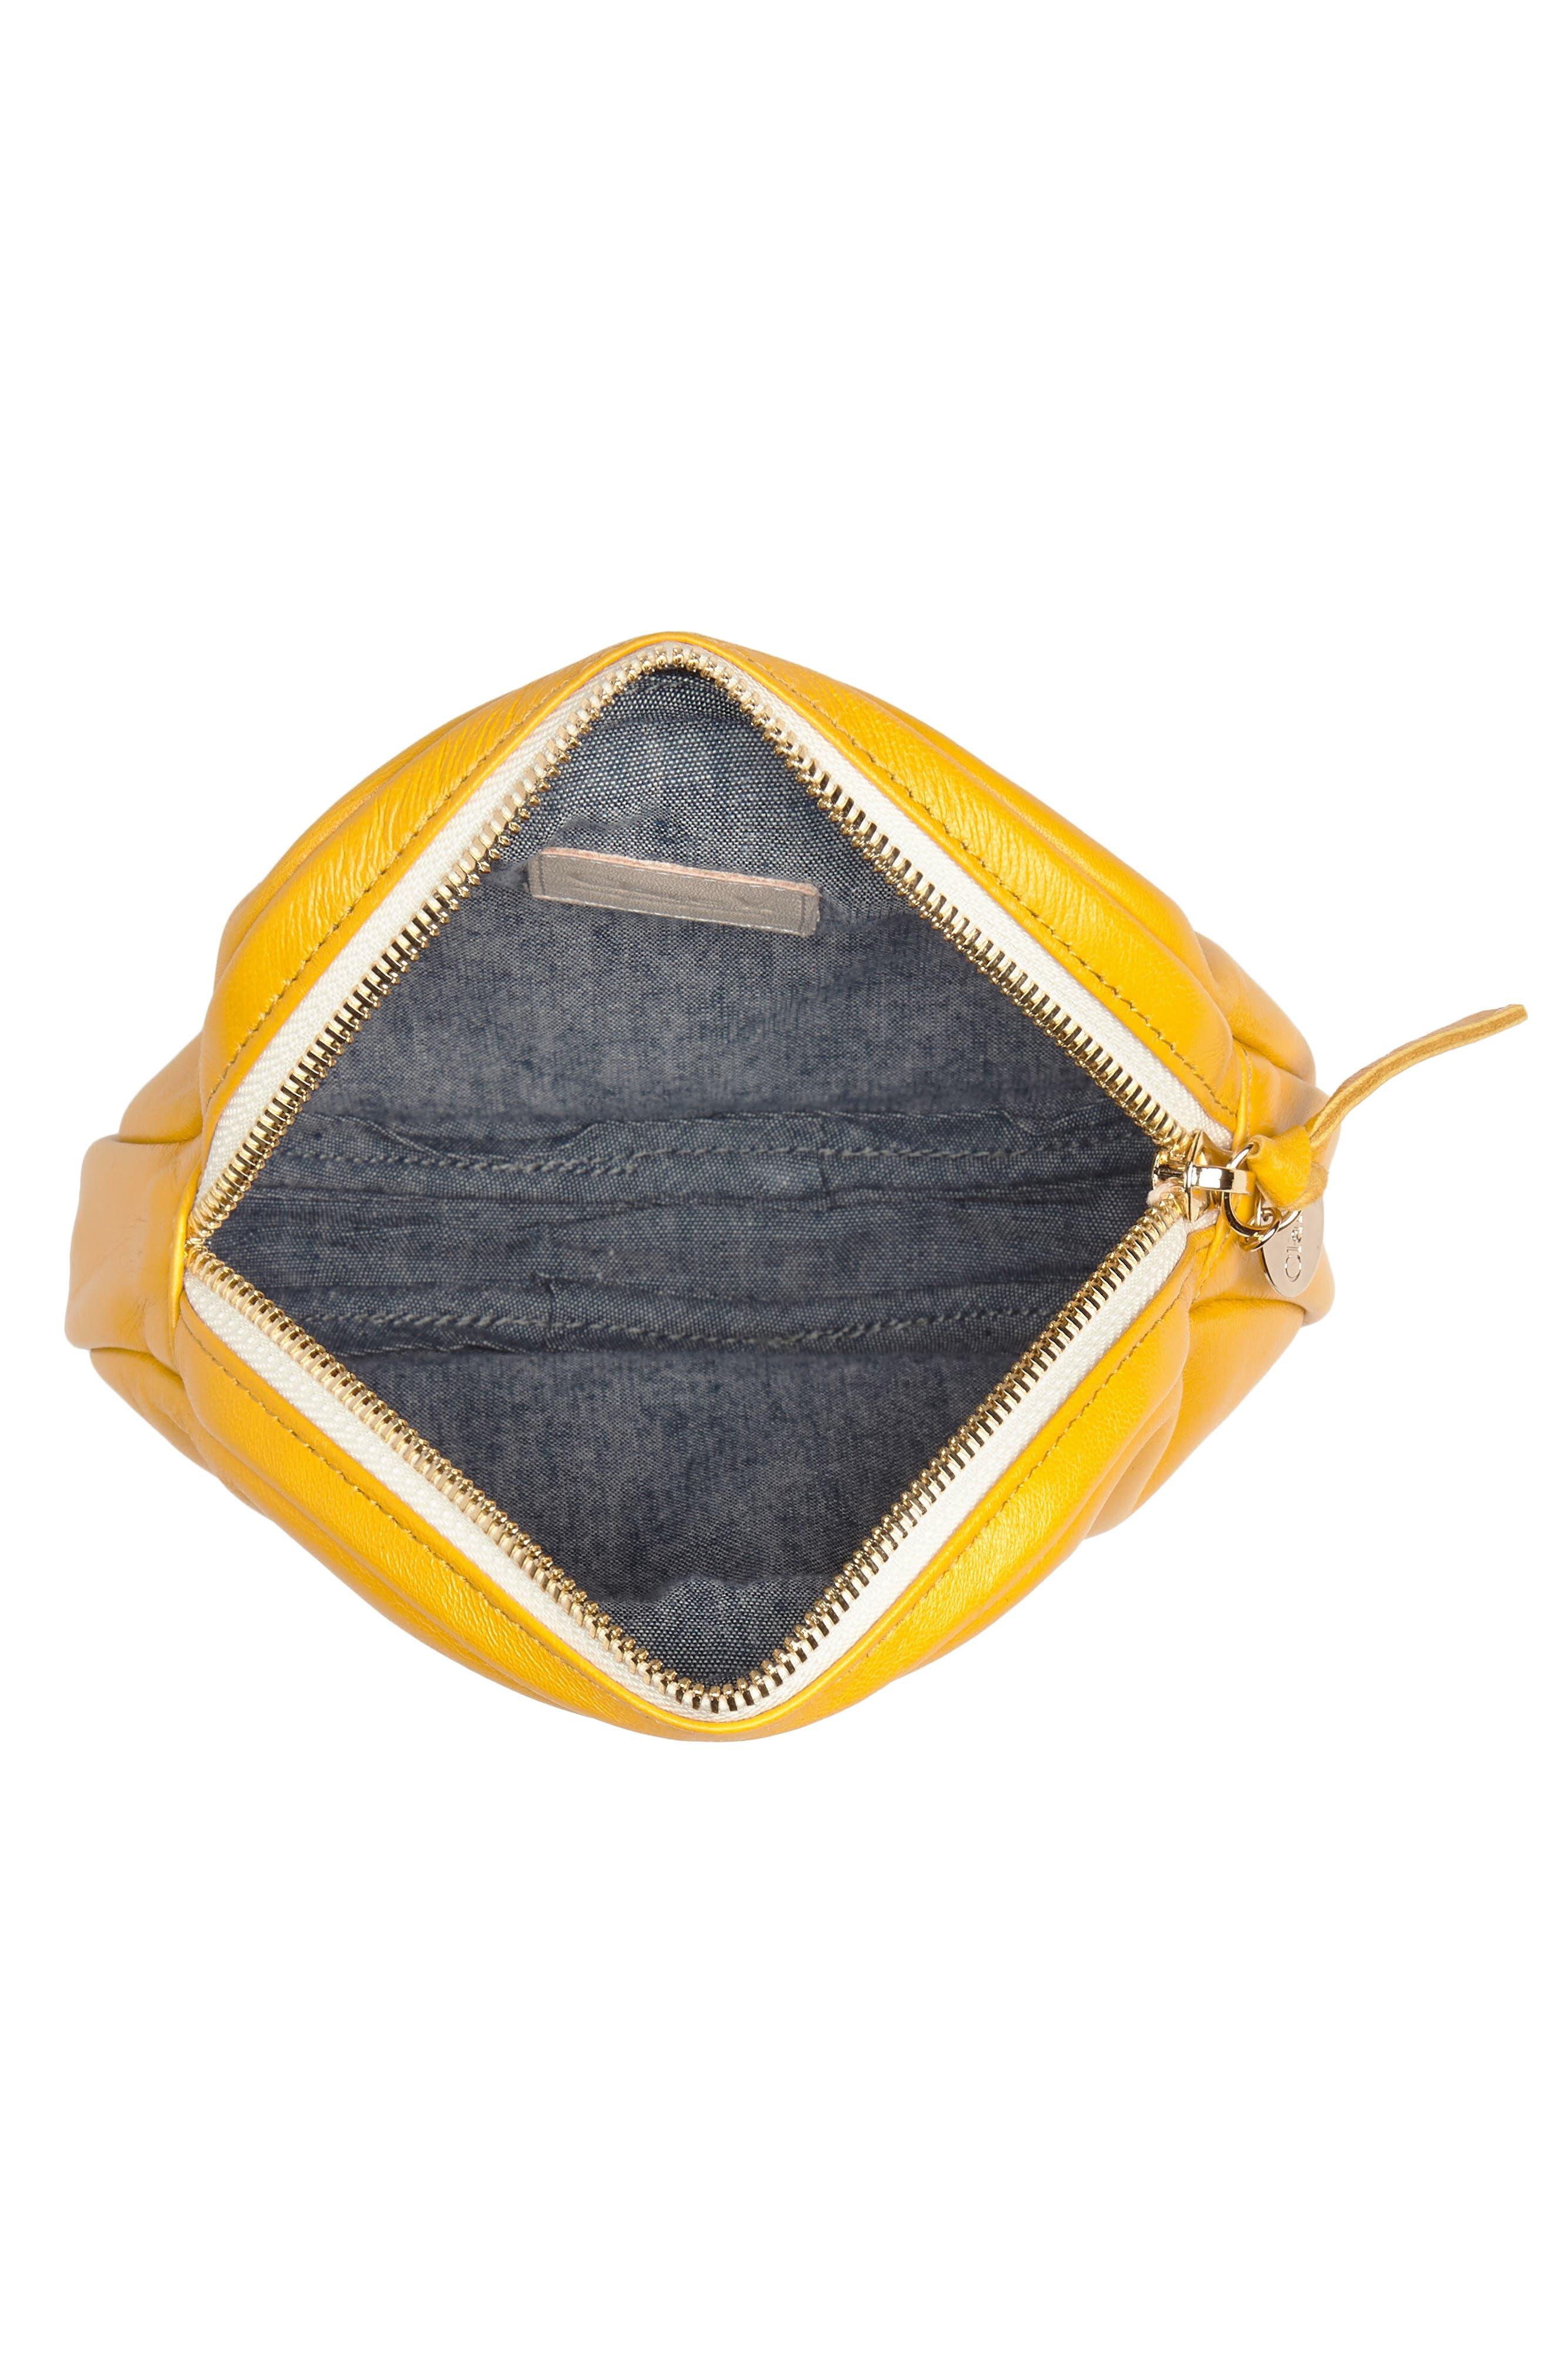 Lambskin Leather Circle Clutch,                             Alternate thumbnail 4, color,                             Yellow Golfa